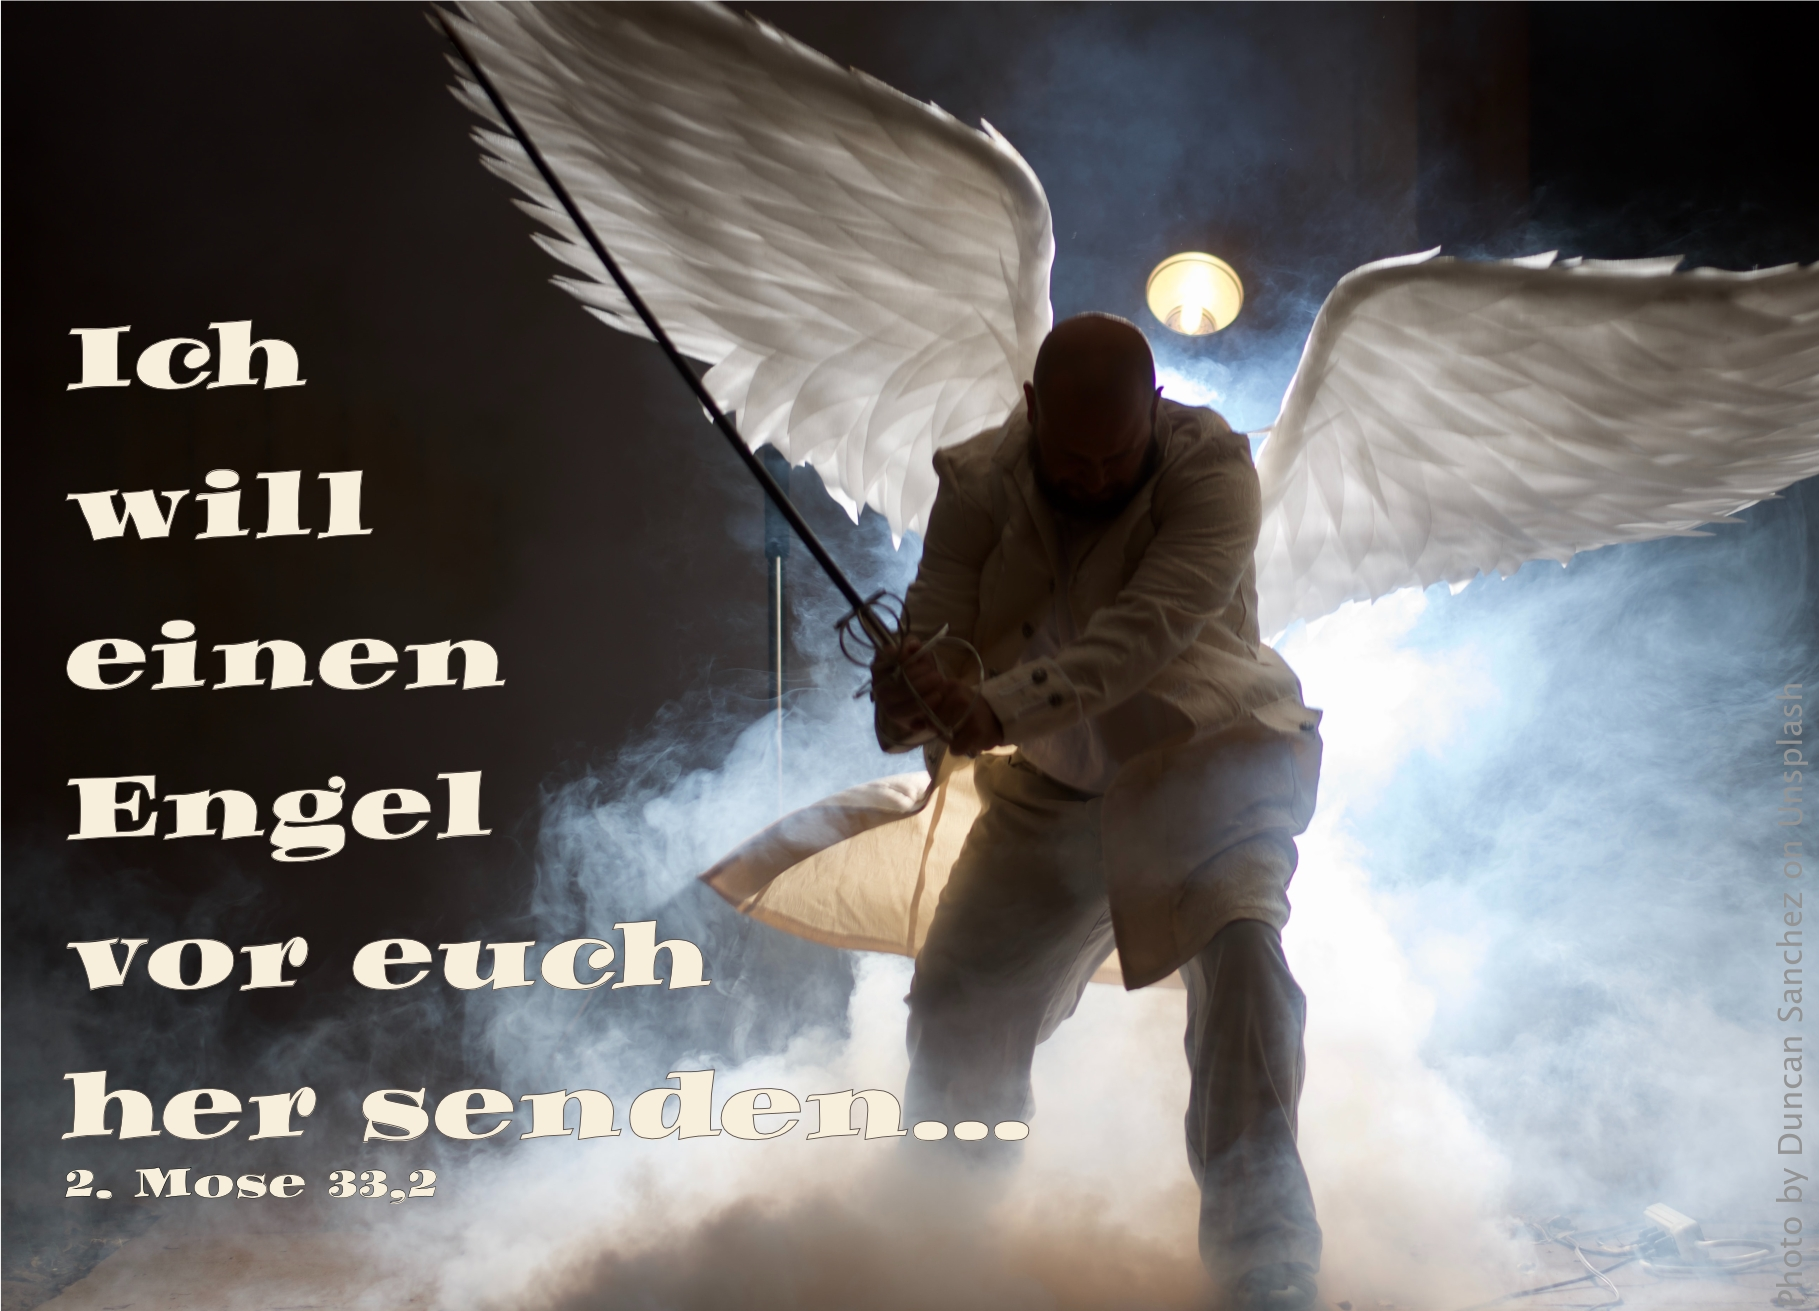 "alt=""engel_mit_schwert_und_fluegeln_erwartet_bibelhoerbuch_das_goldene_kalb"""